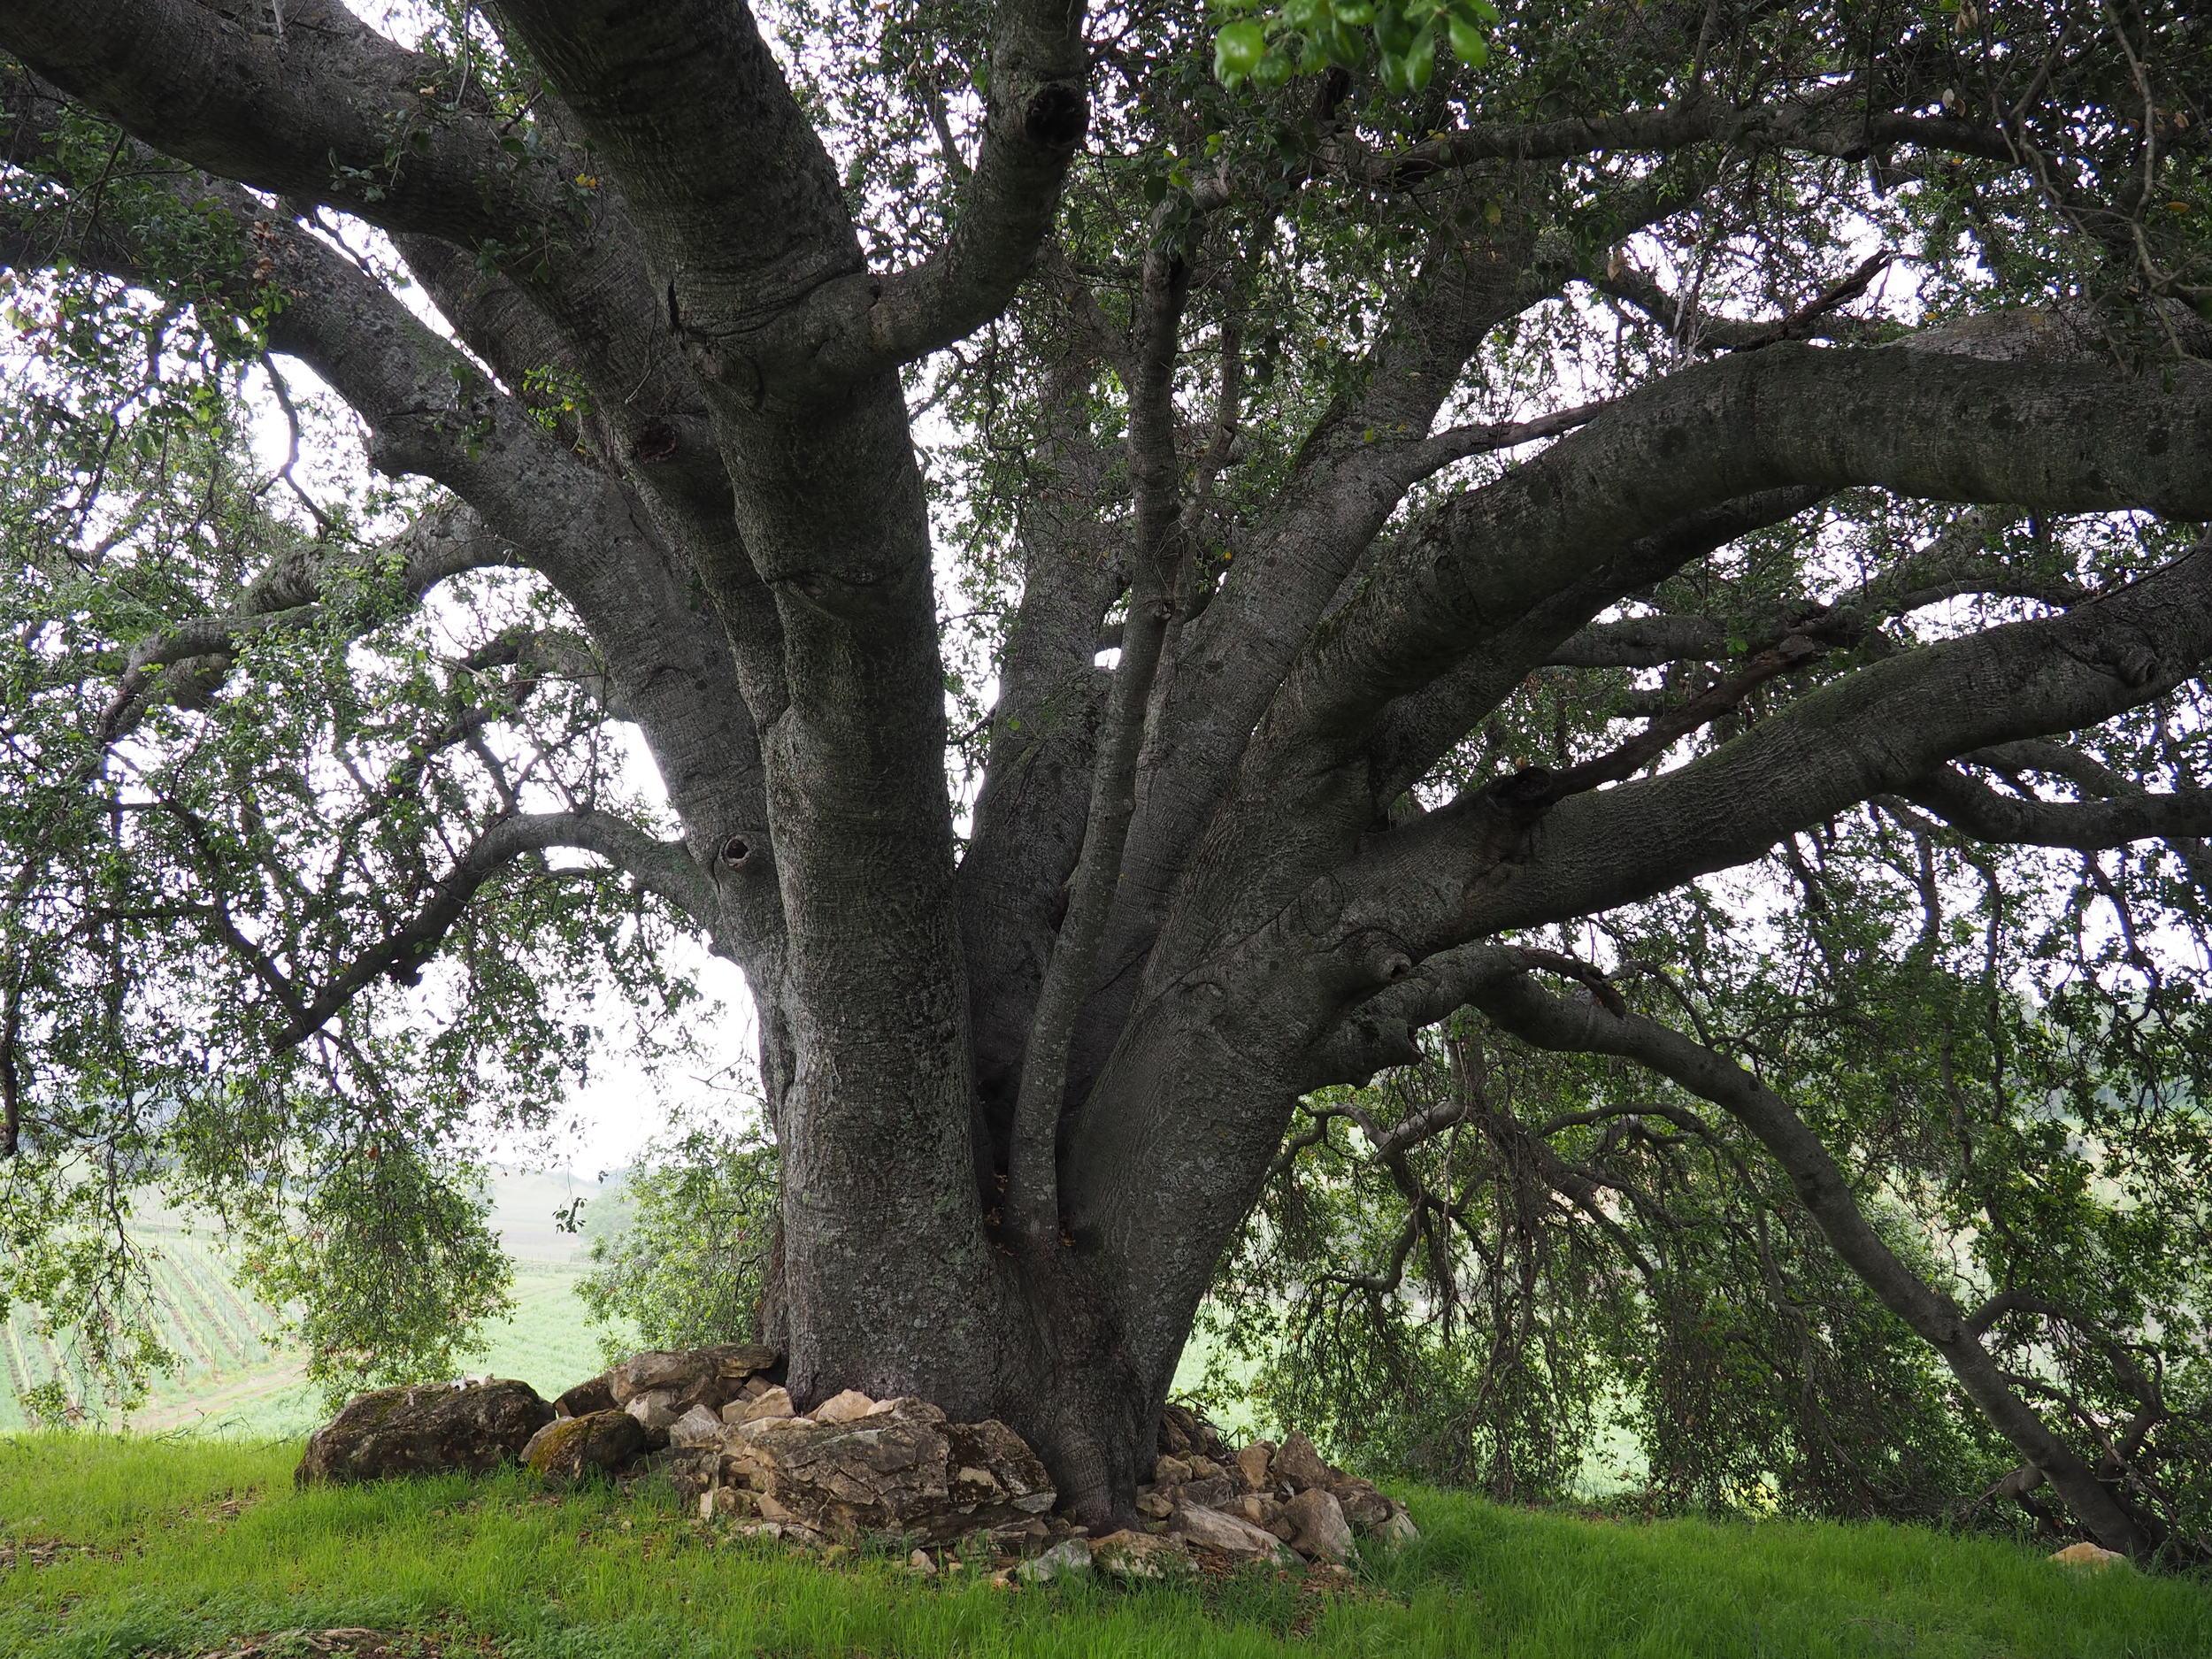 wine tasting in paso robles / ancestor tree halter ranch vineyard excursion tour